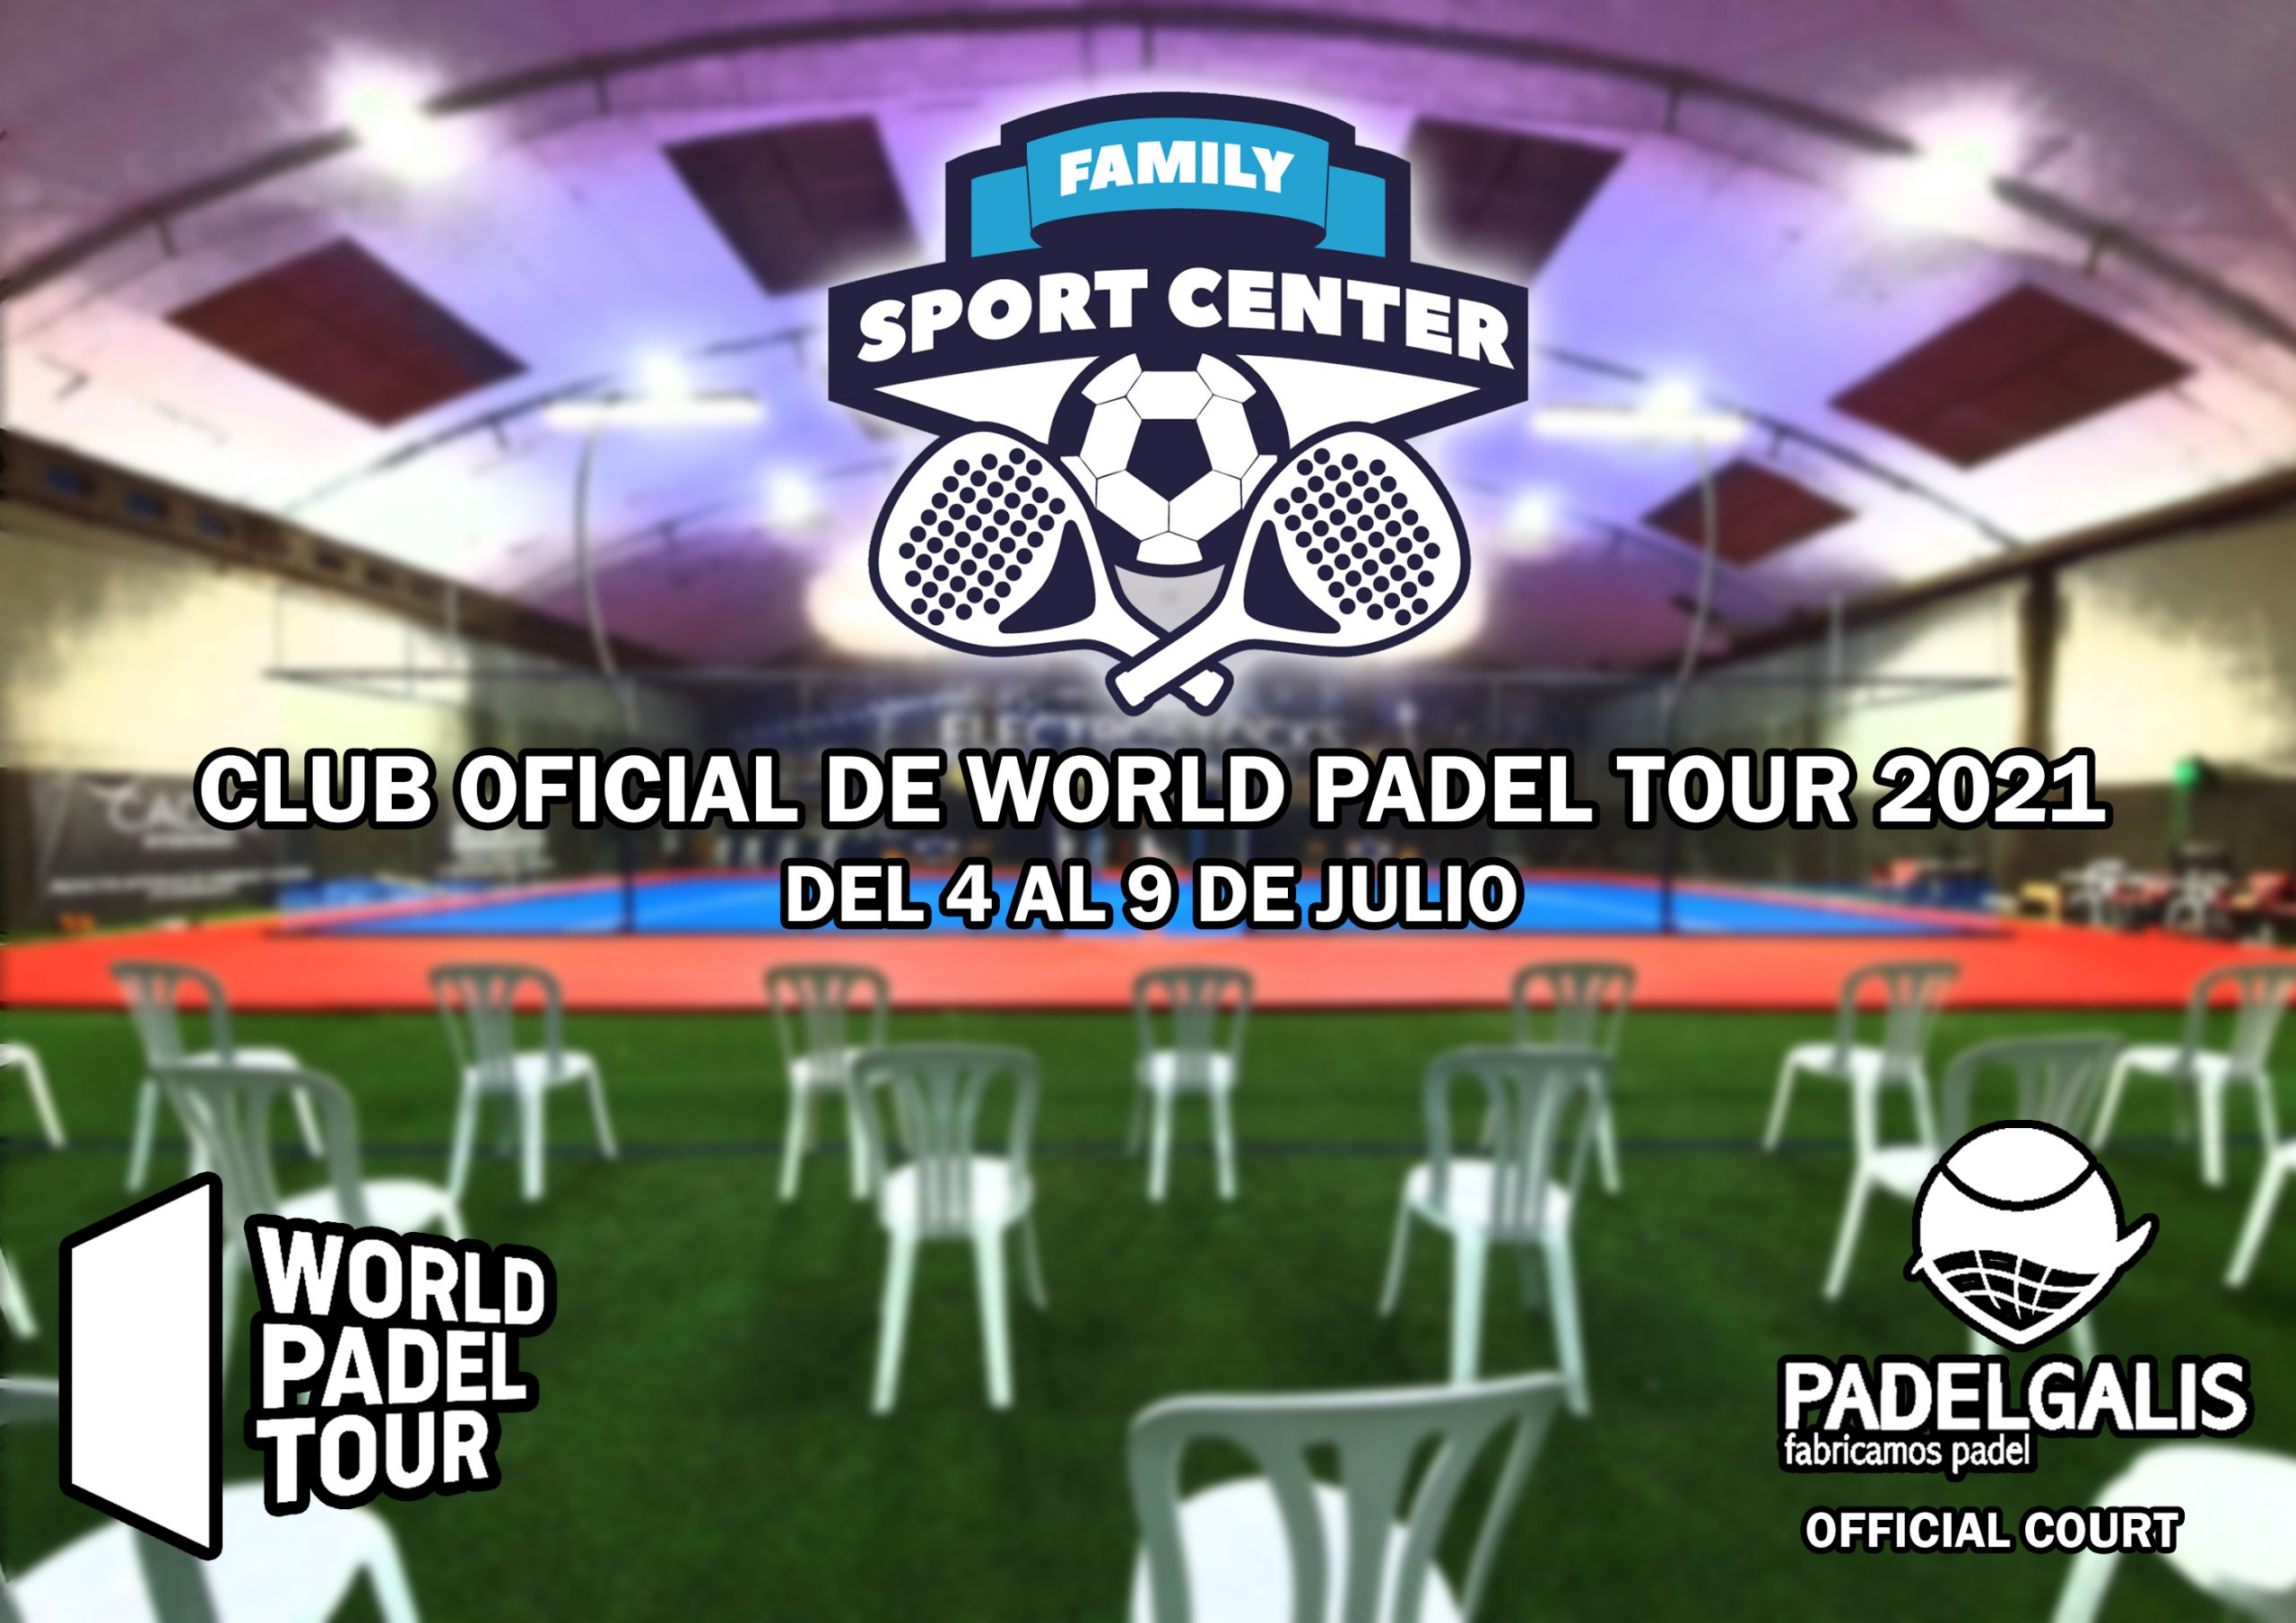 CLUB OFICIAL DE WORDL PADEL TOUR 2021